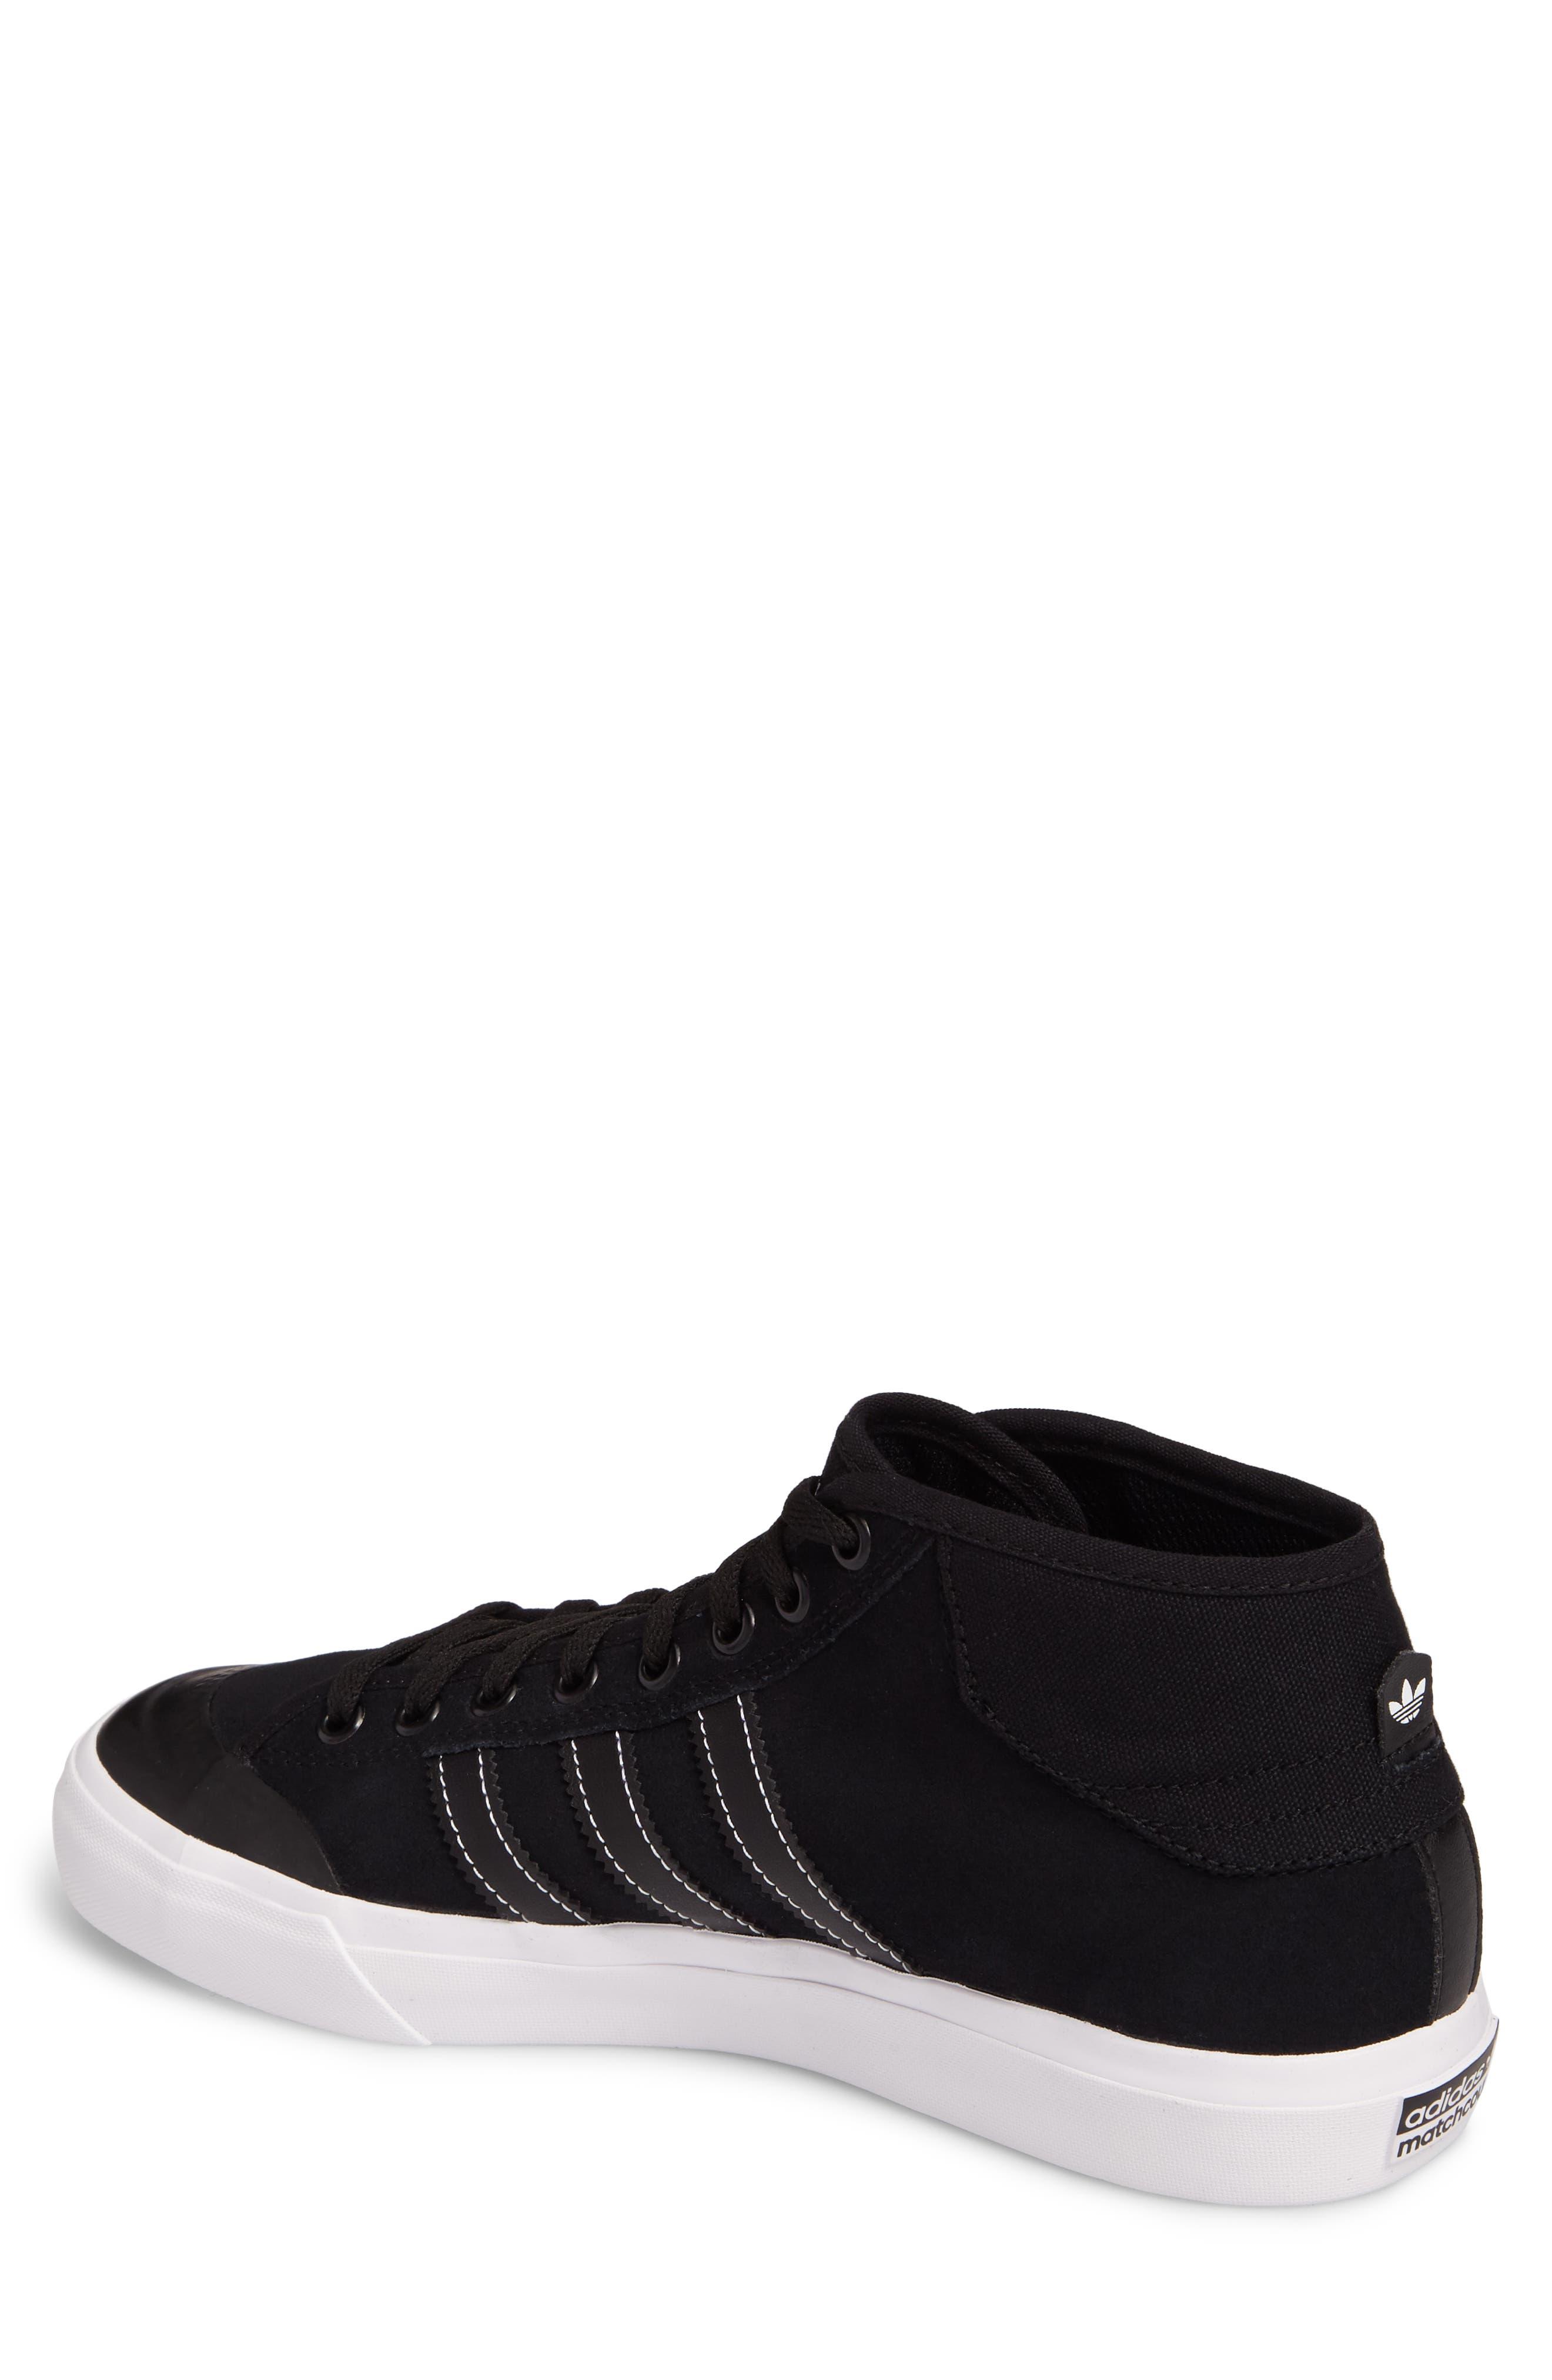 Matchcourt Mid ADV Sneaker,                             Alternate thumbnail 2, color,                             001